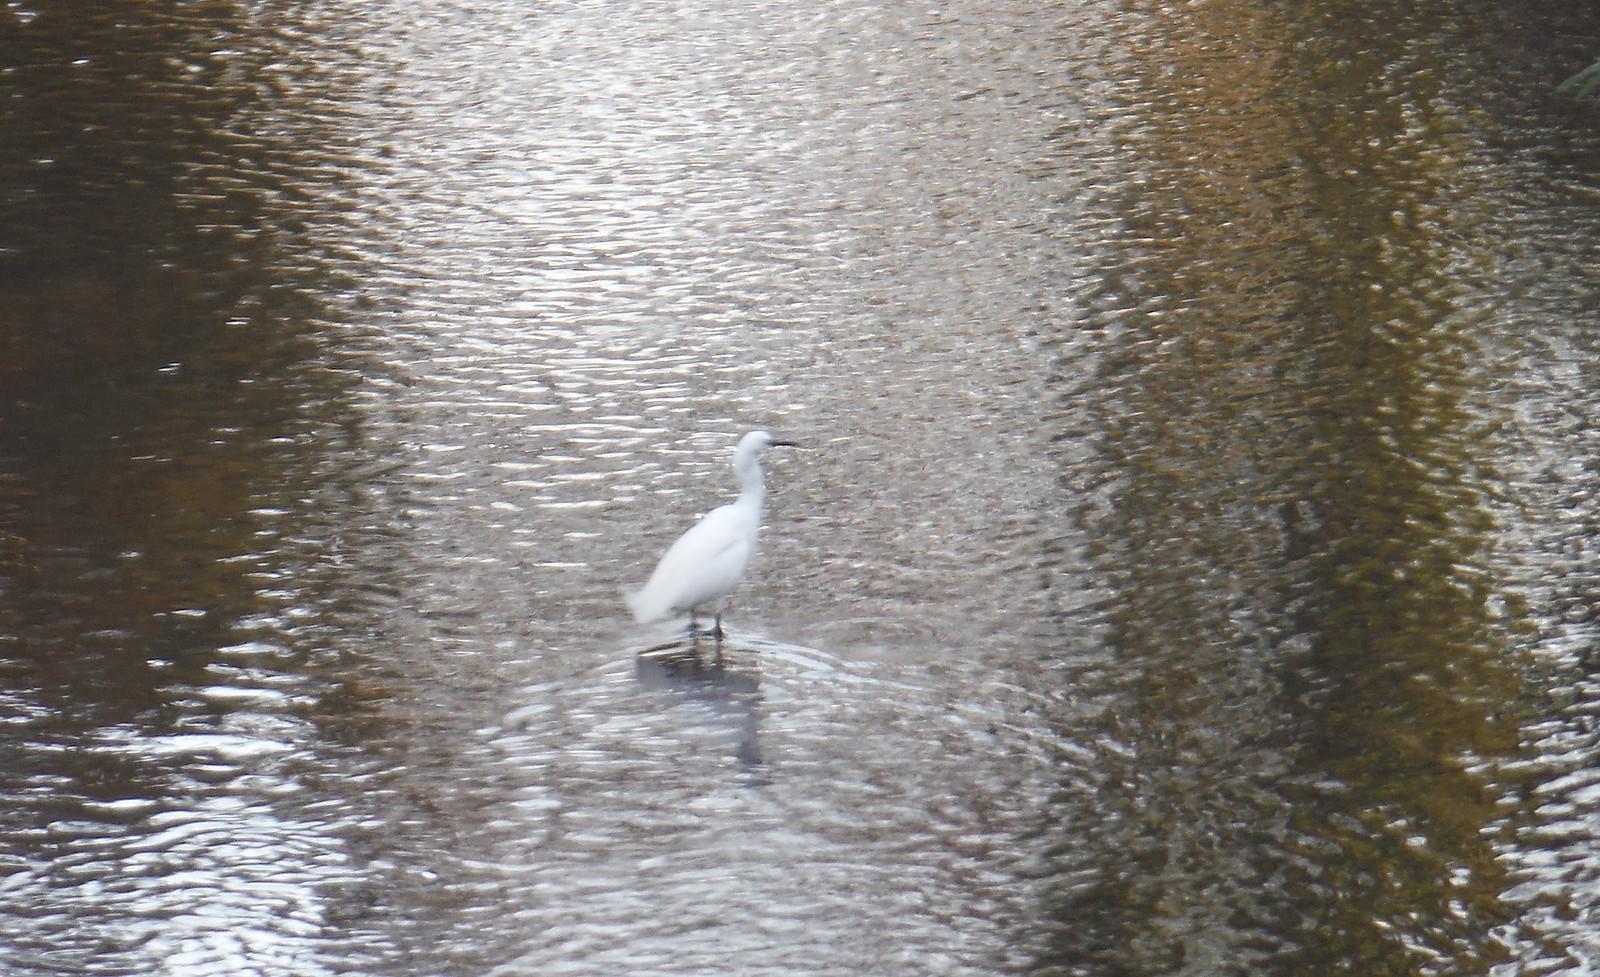 Birdlife in The Ravensbourne, Ladywell Fields SWC Short Walk 36 - Waterlink Way (Lower Sydenham to Greenwich)